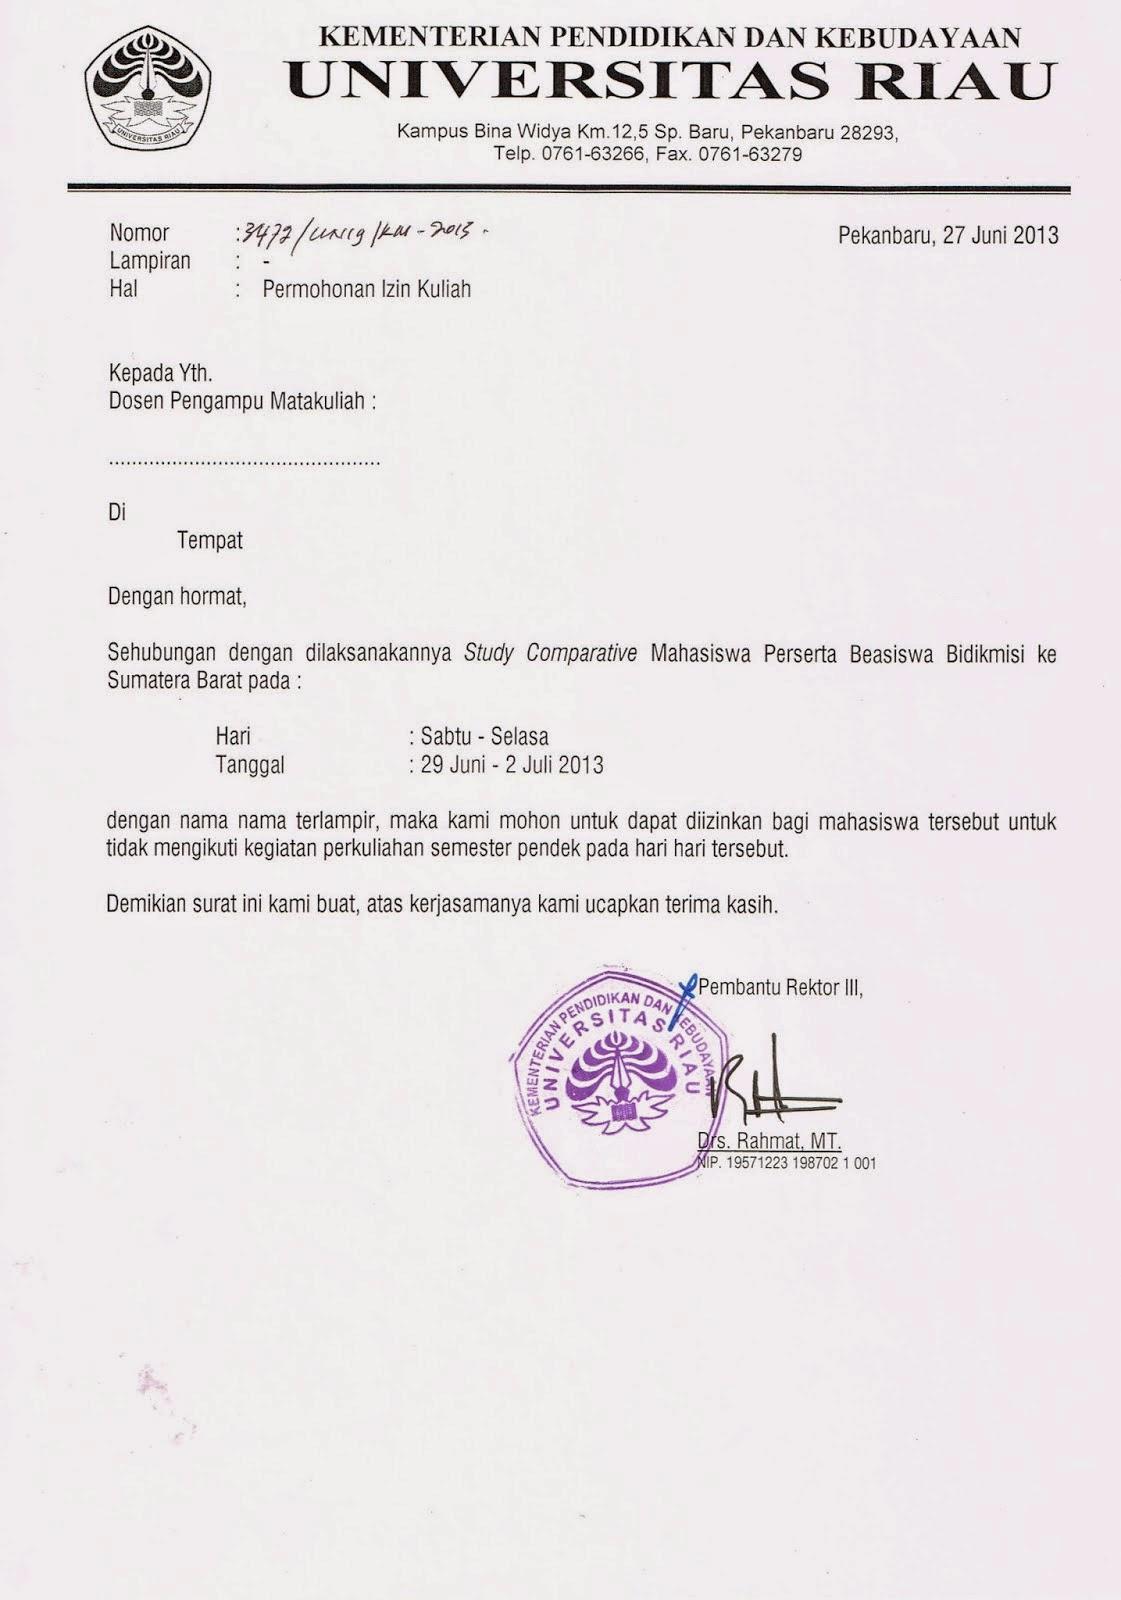 Contoh Surat Izin Tidak Masuk Kuliyah   Skripsi PAI